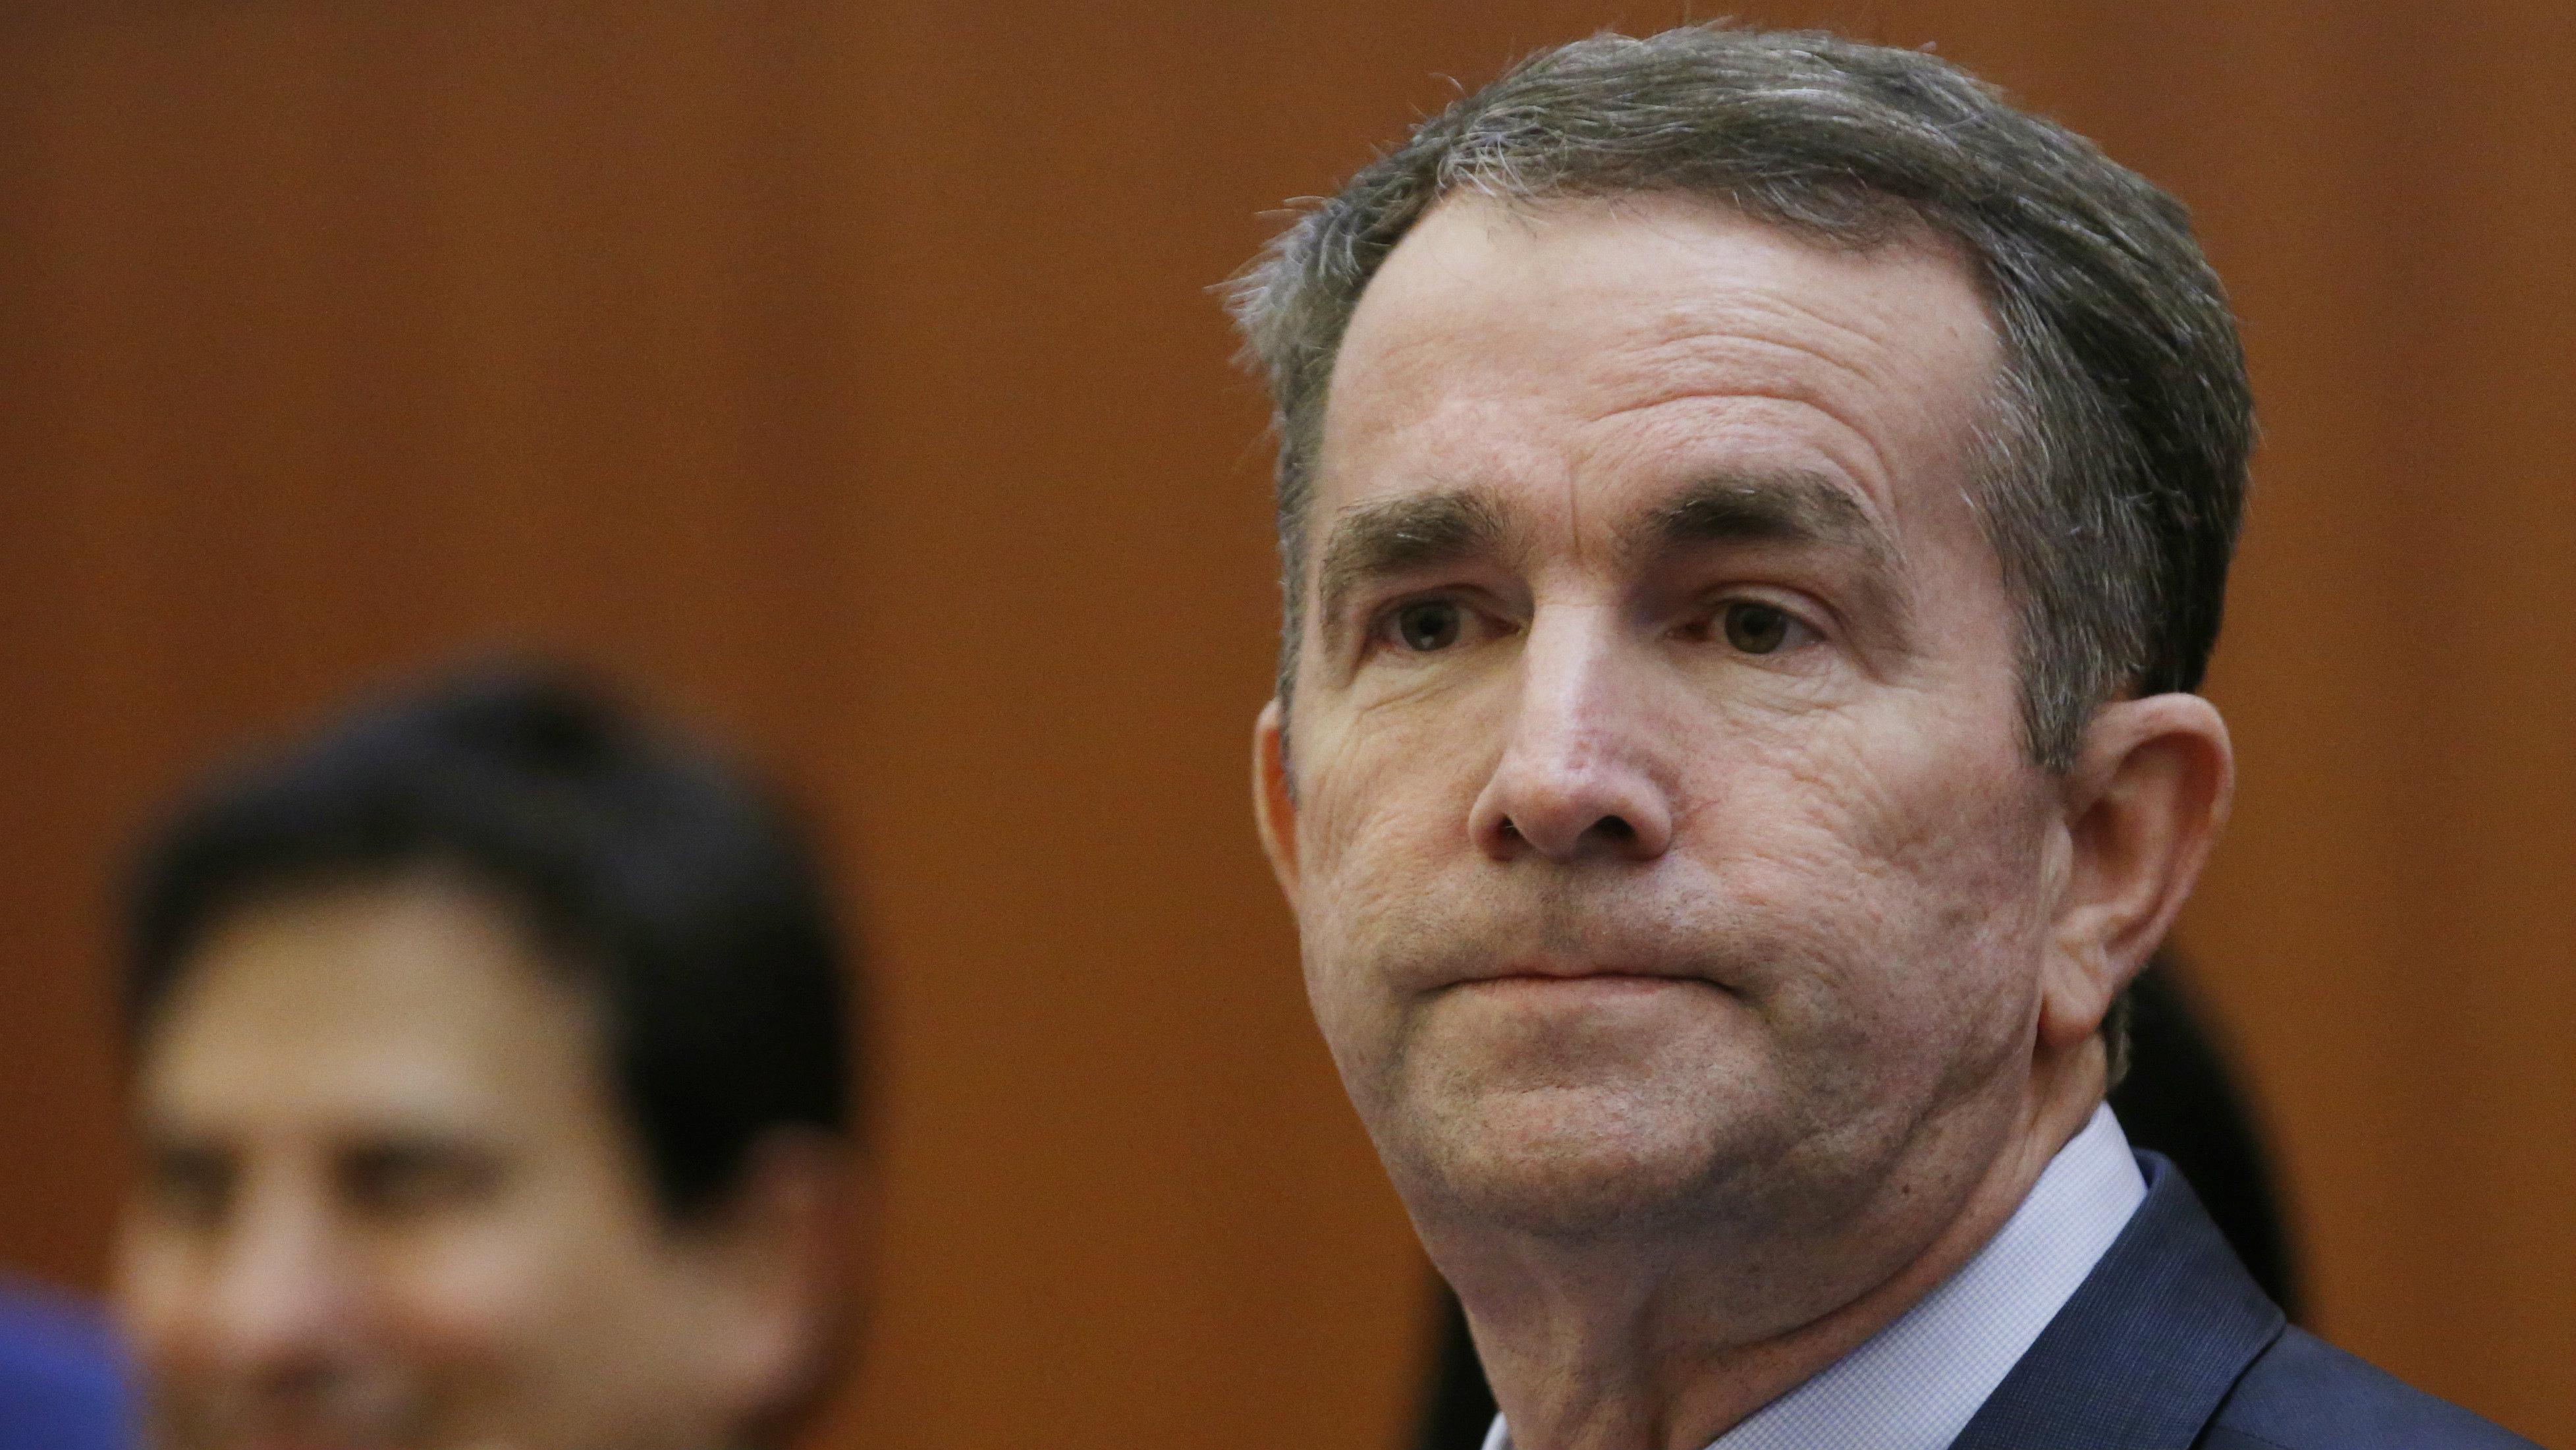 Ralph Northam faces calls to resign